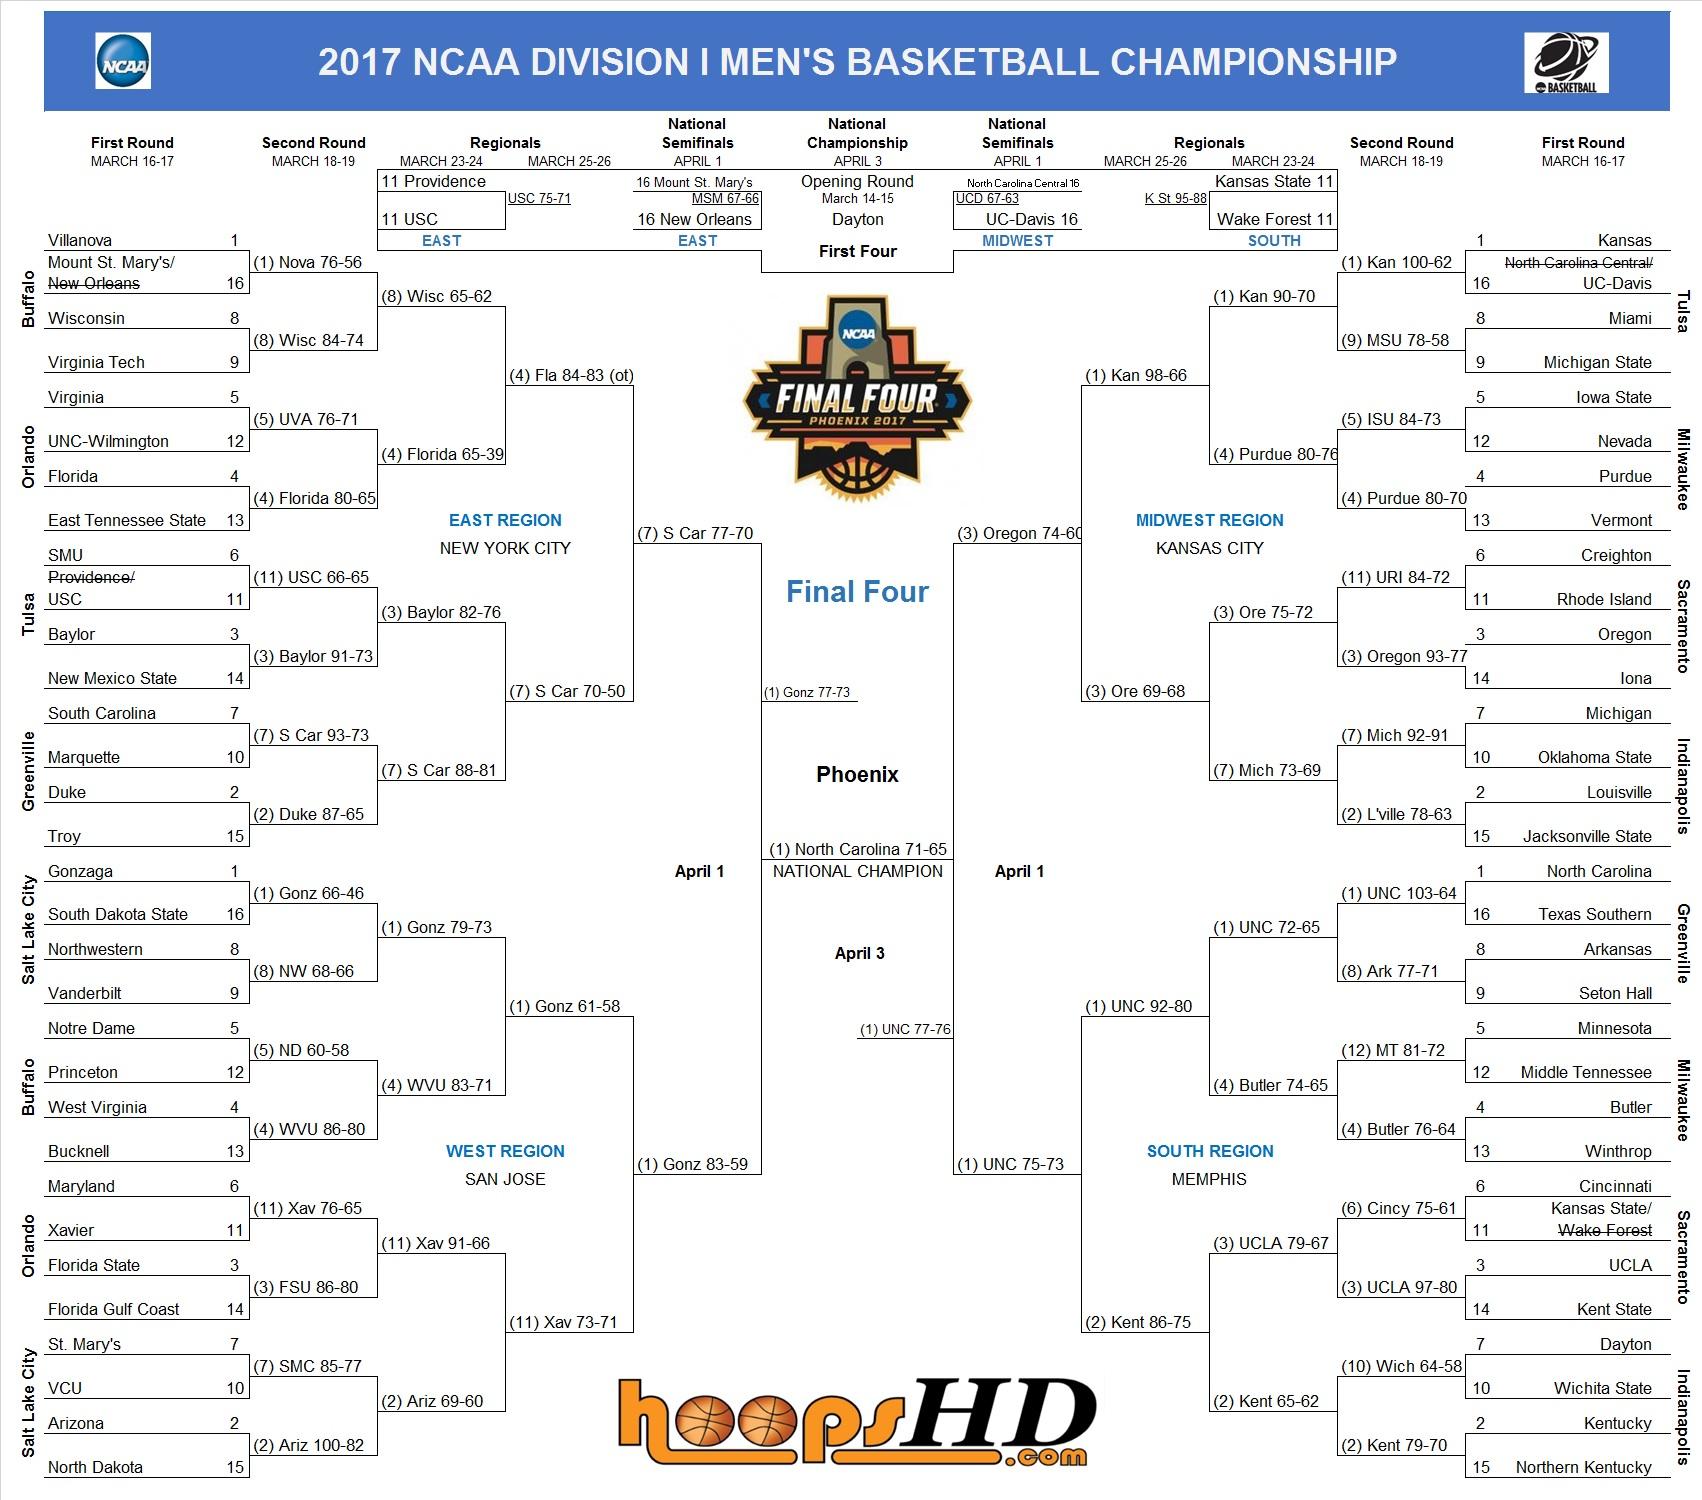 College Basketball Rankings | Basketball Scores